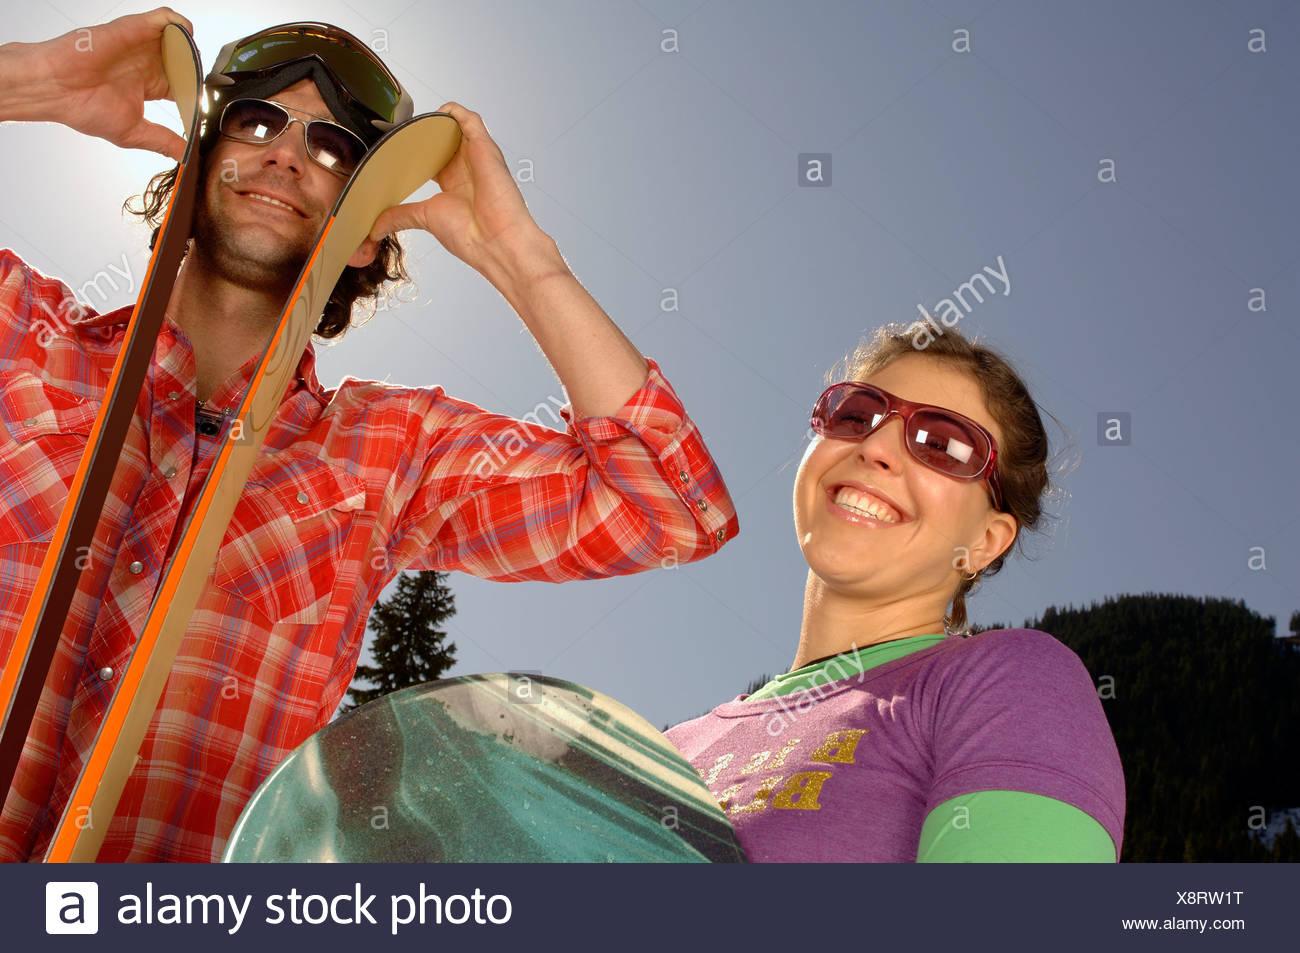 Skiing couple smiling - Stock Image